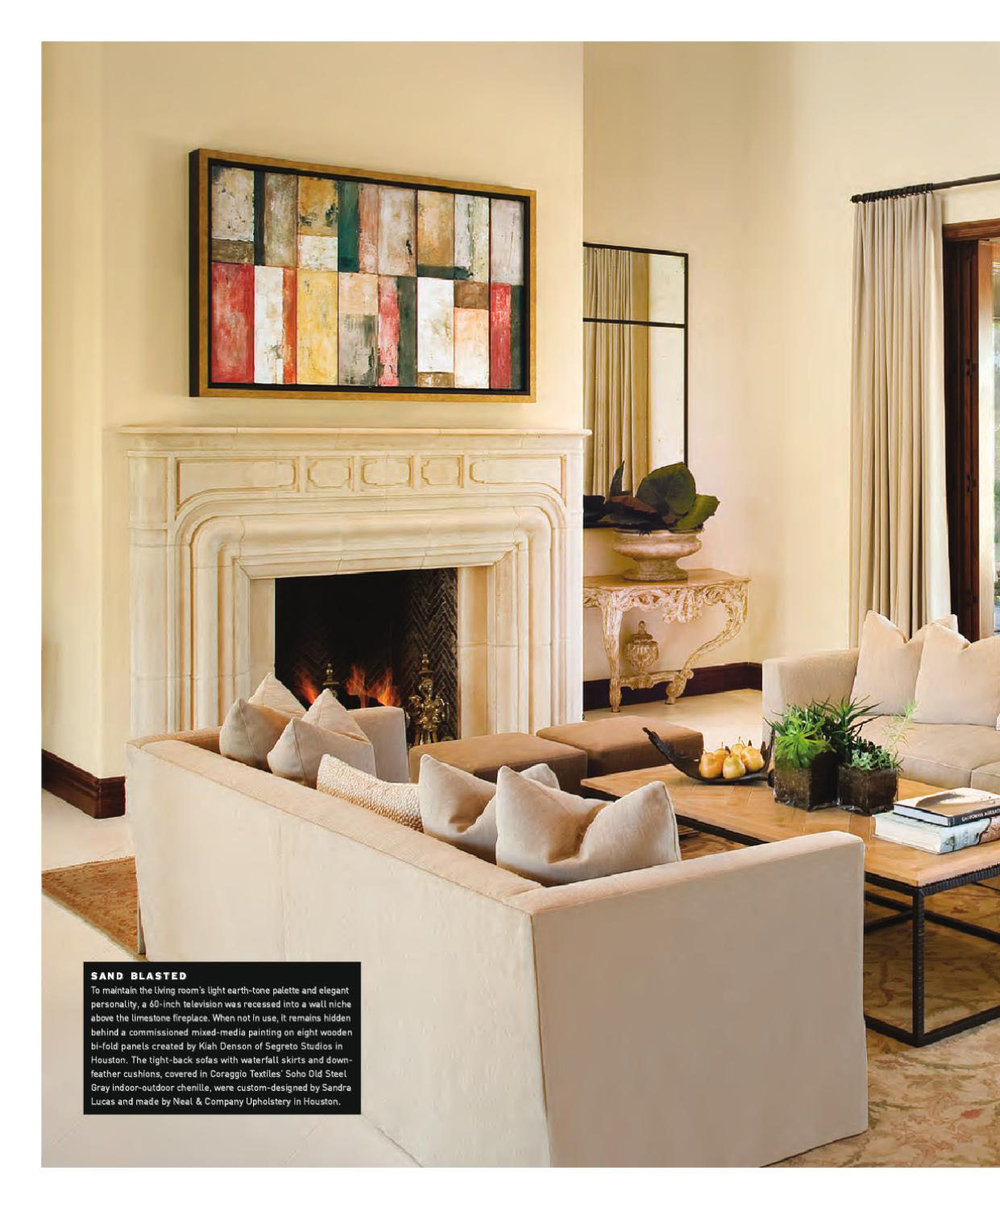 Custom art above fireplace